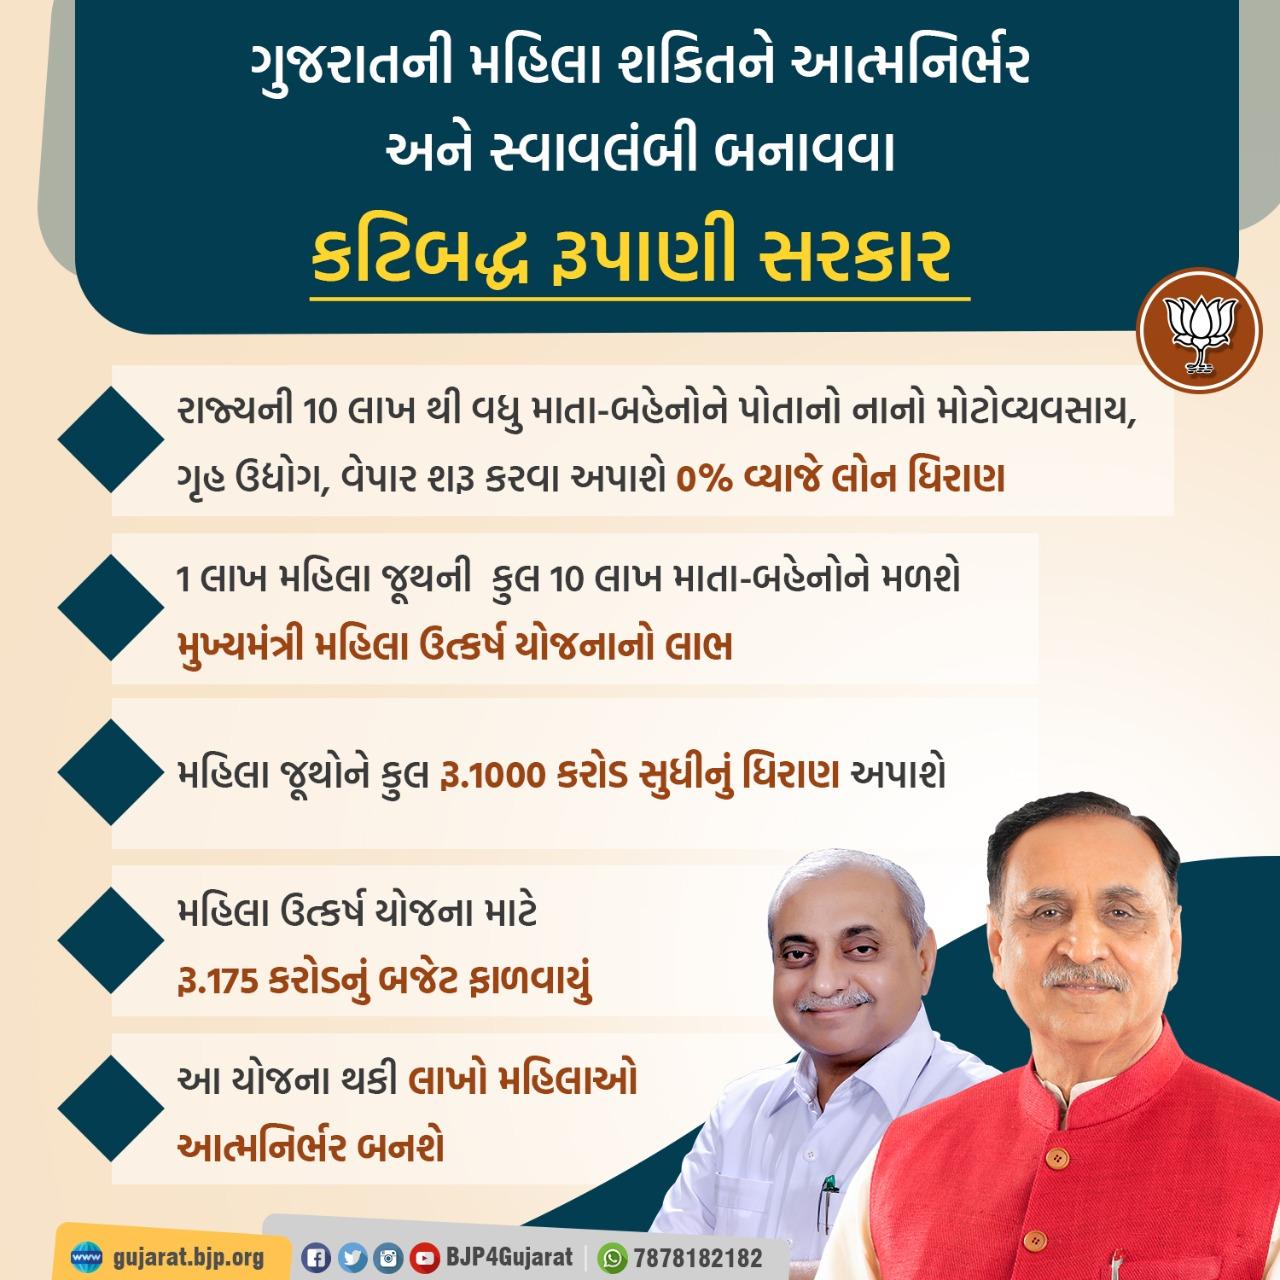 Mukhyamantri Mahila Utkarsh Yojana Gujarat / Women Upliftment Scheme Gujarat 2020